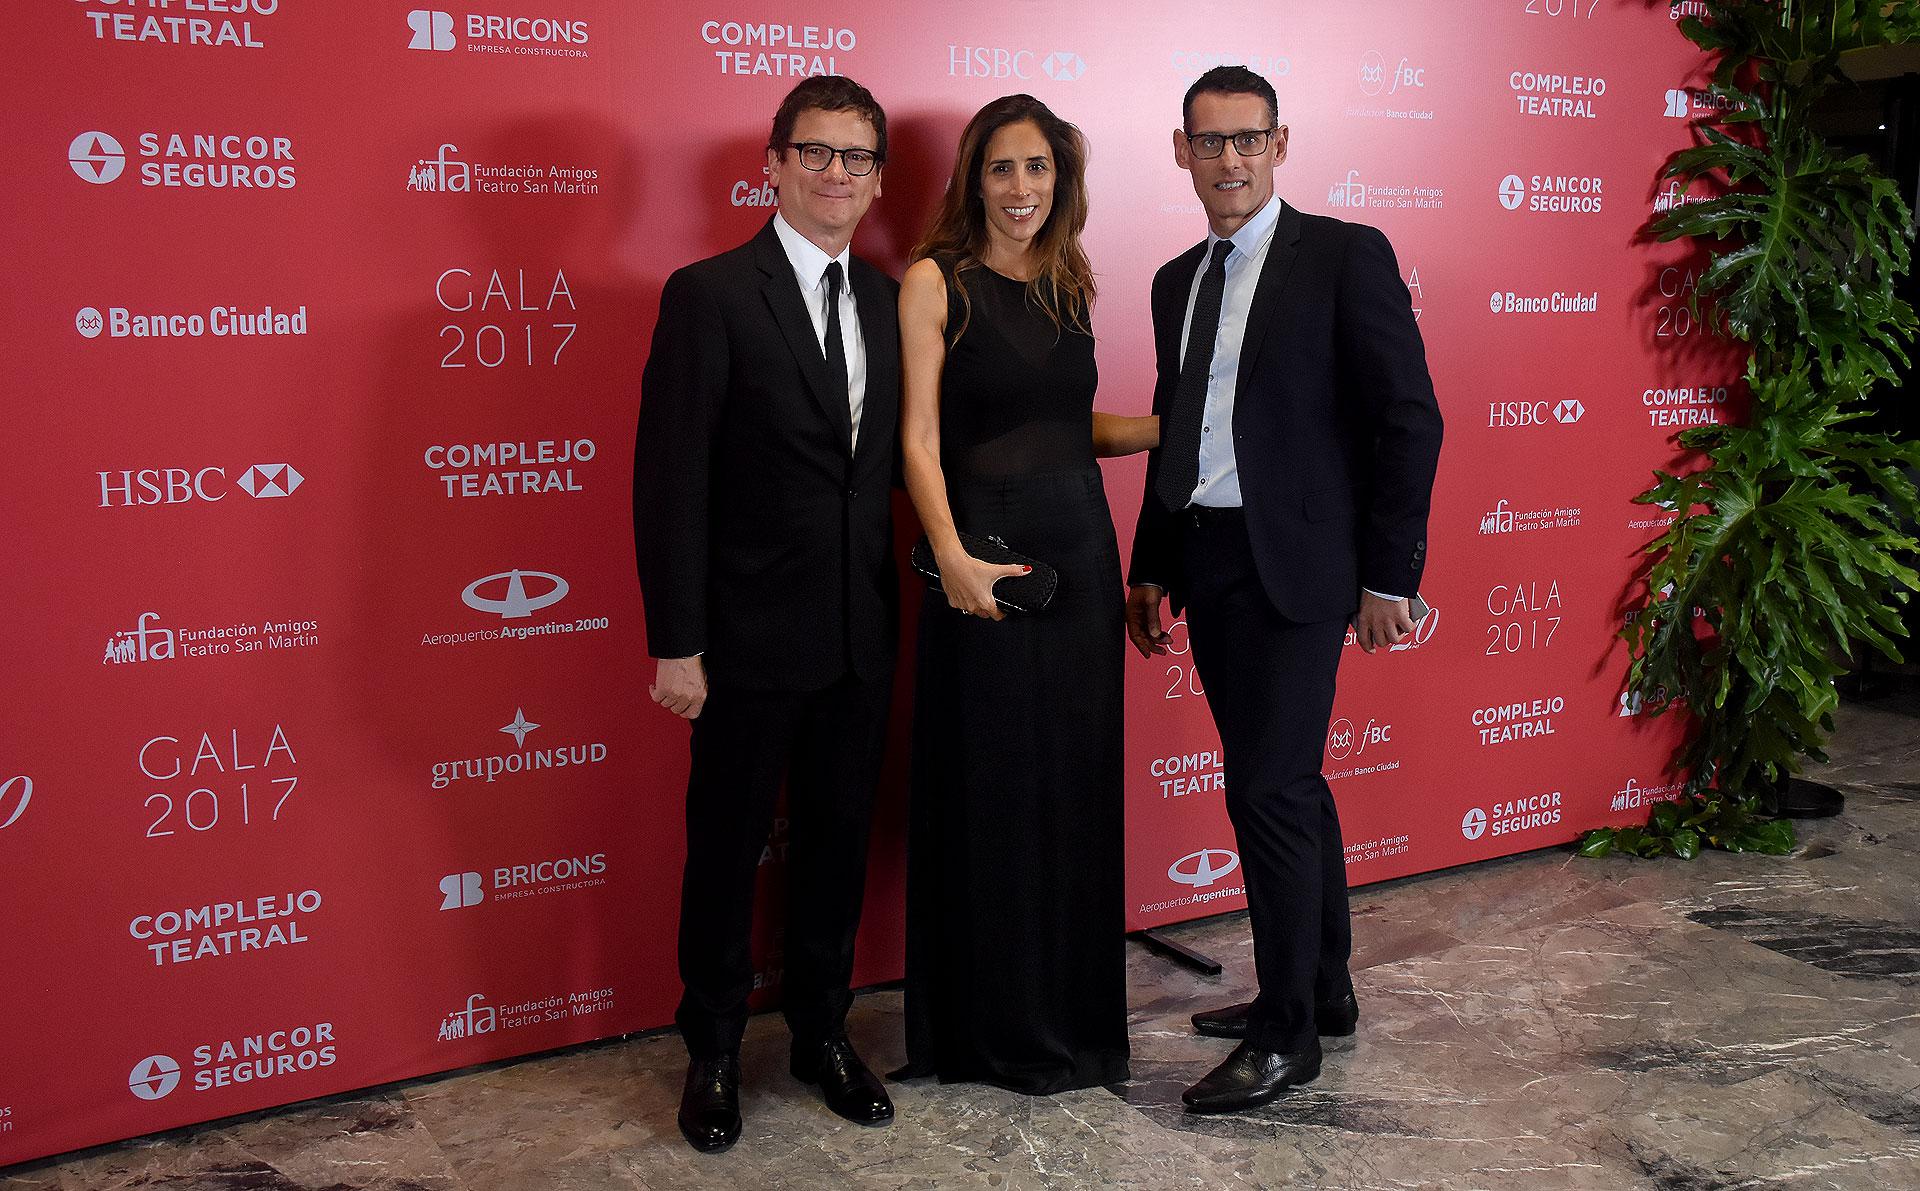 Gabriel Martino, presidente de HSBC Argentina, su mujer Florencia Perotti y Fabián Bottegal